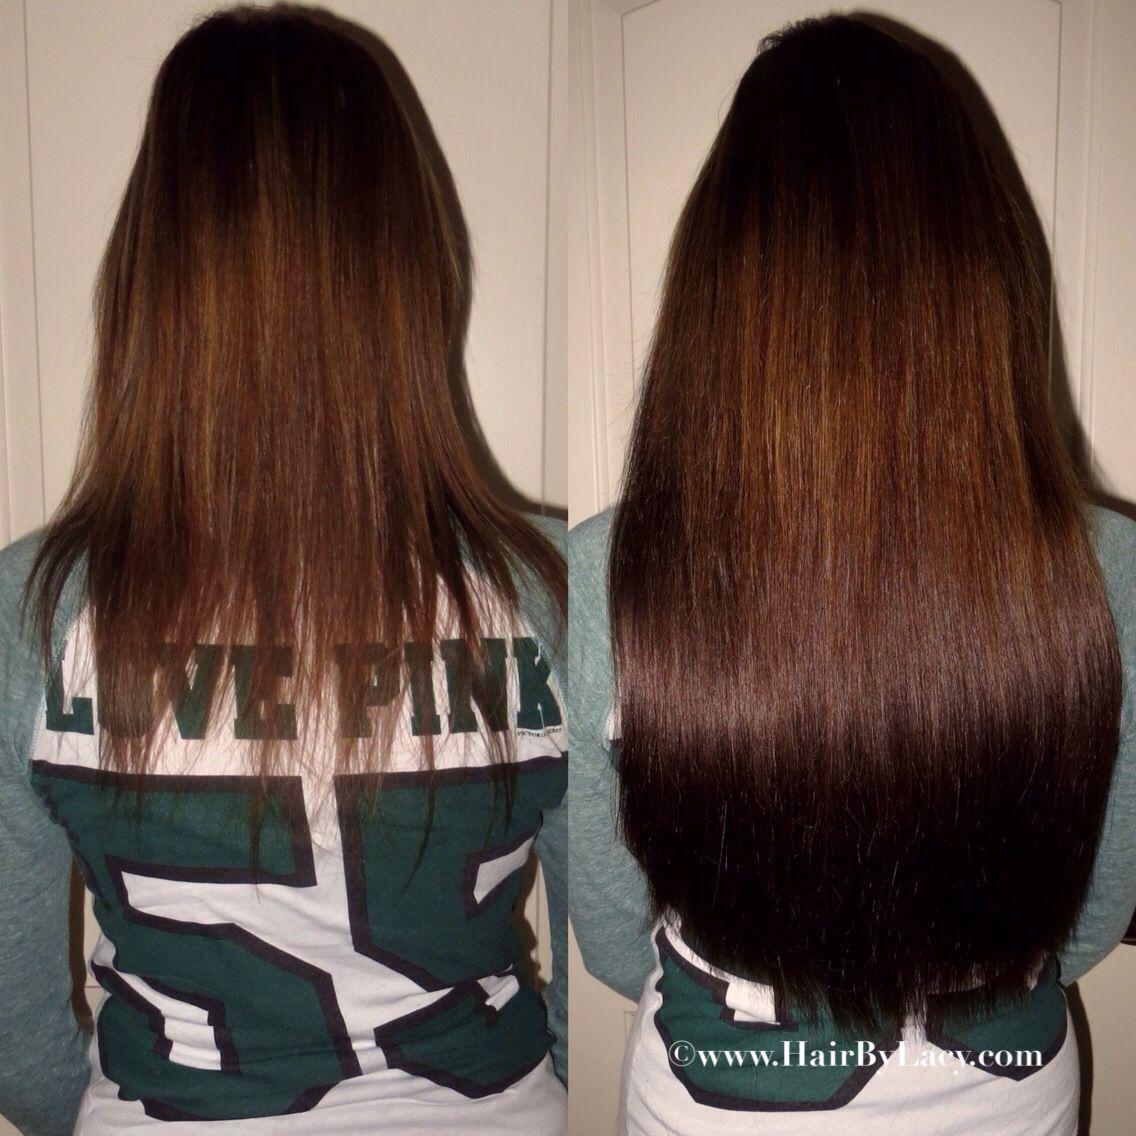 Elite Extensions Livonia Michigan Hair Pinterest Extensions